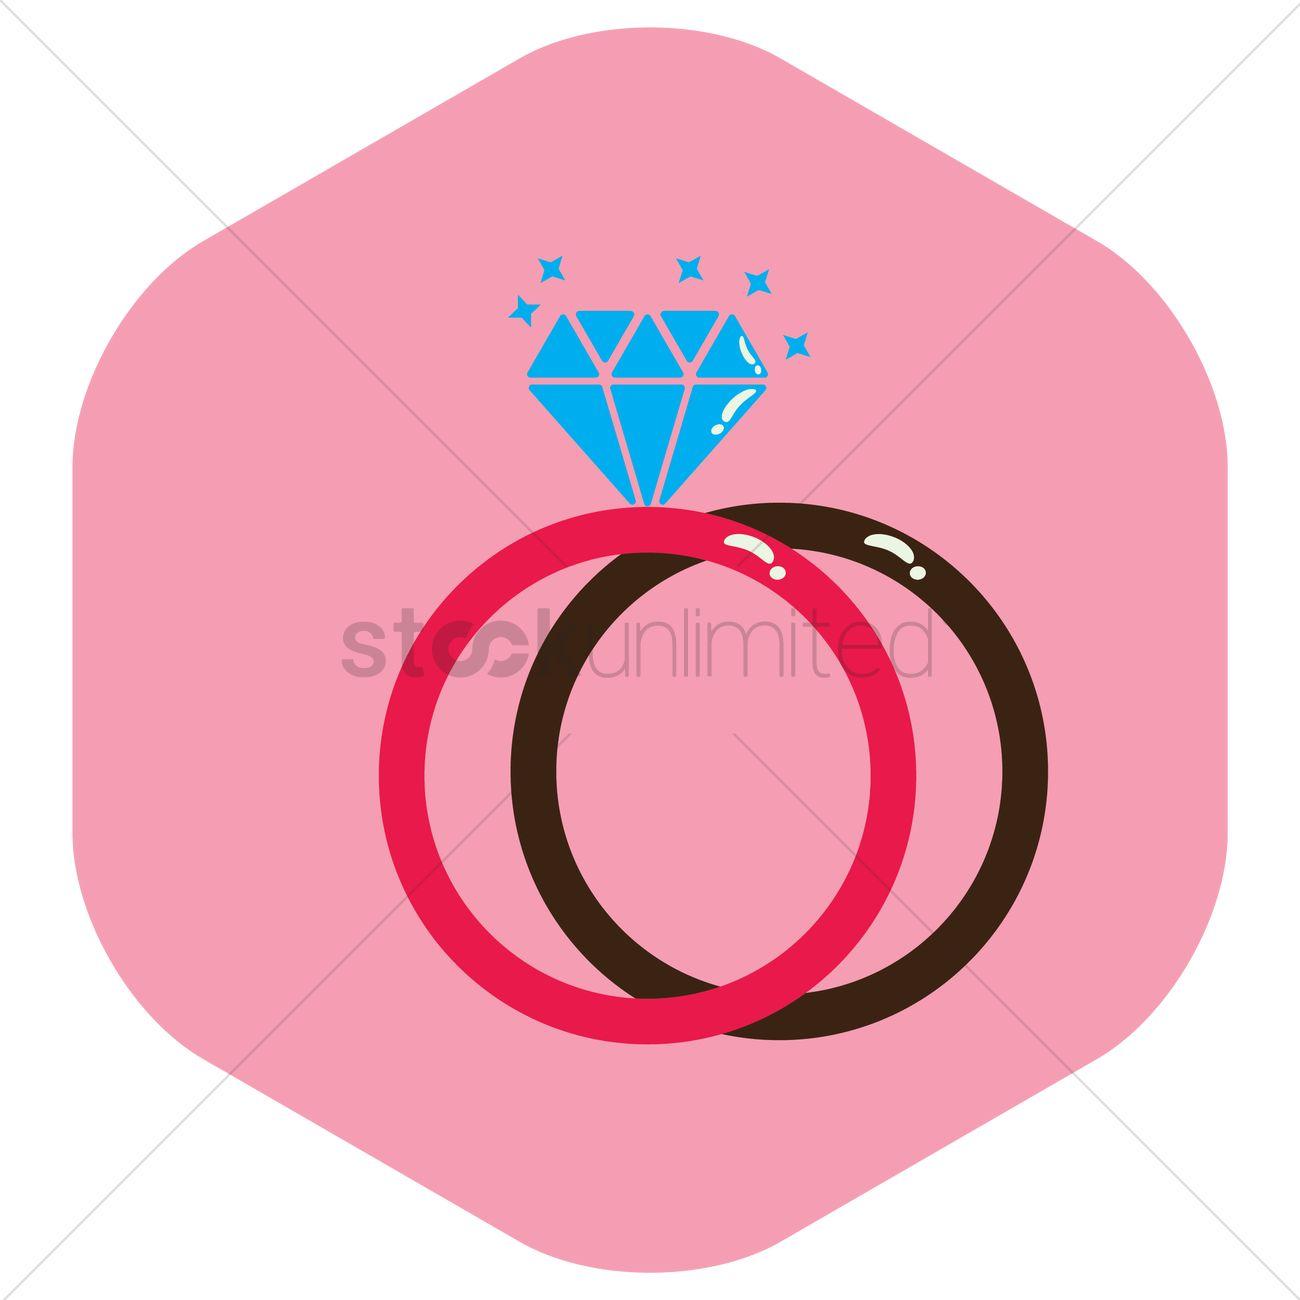 Wedding rings Vector Image - 1446798 | StockUnlimited